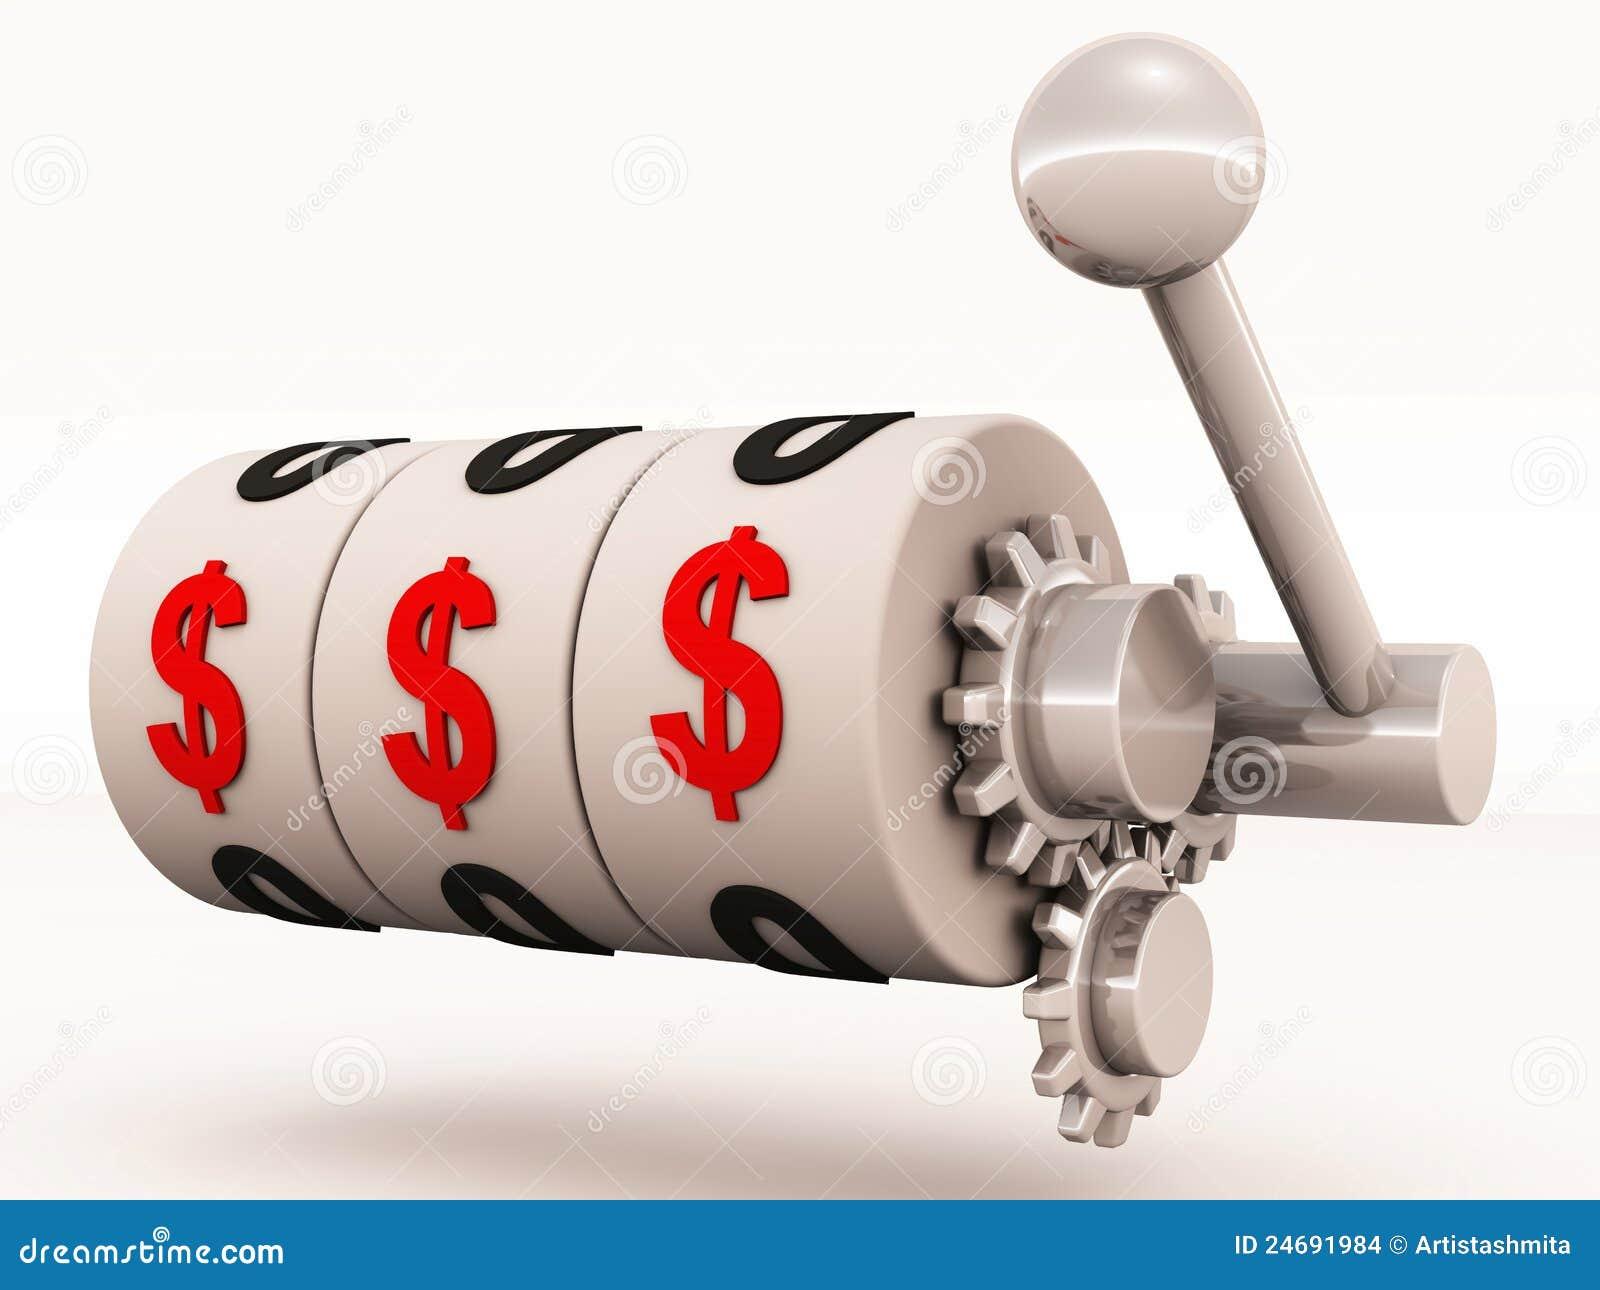 slot machine games win money fun house slot games